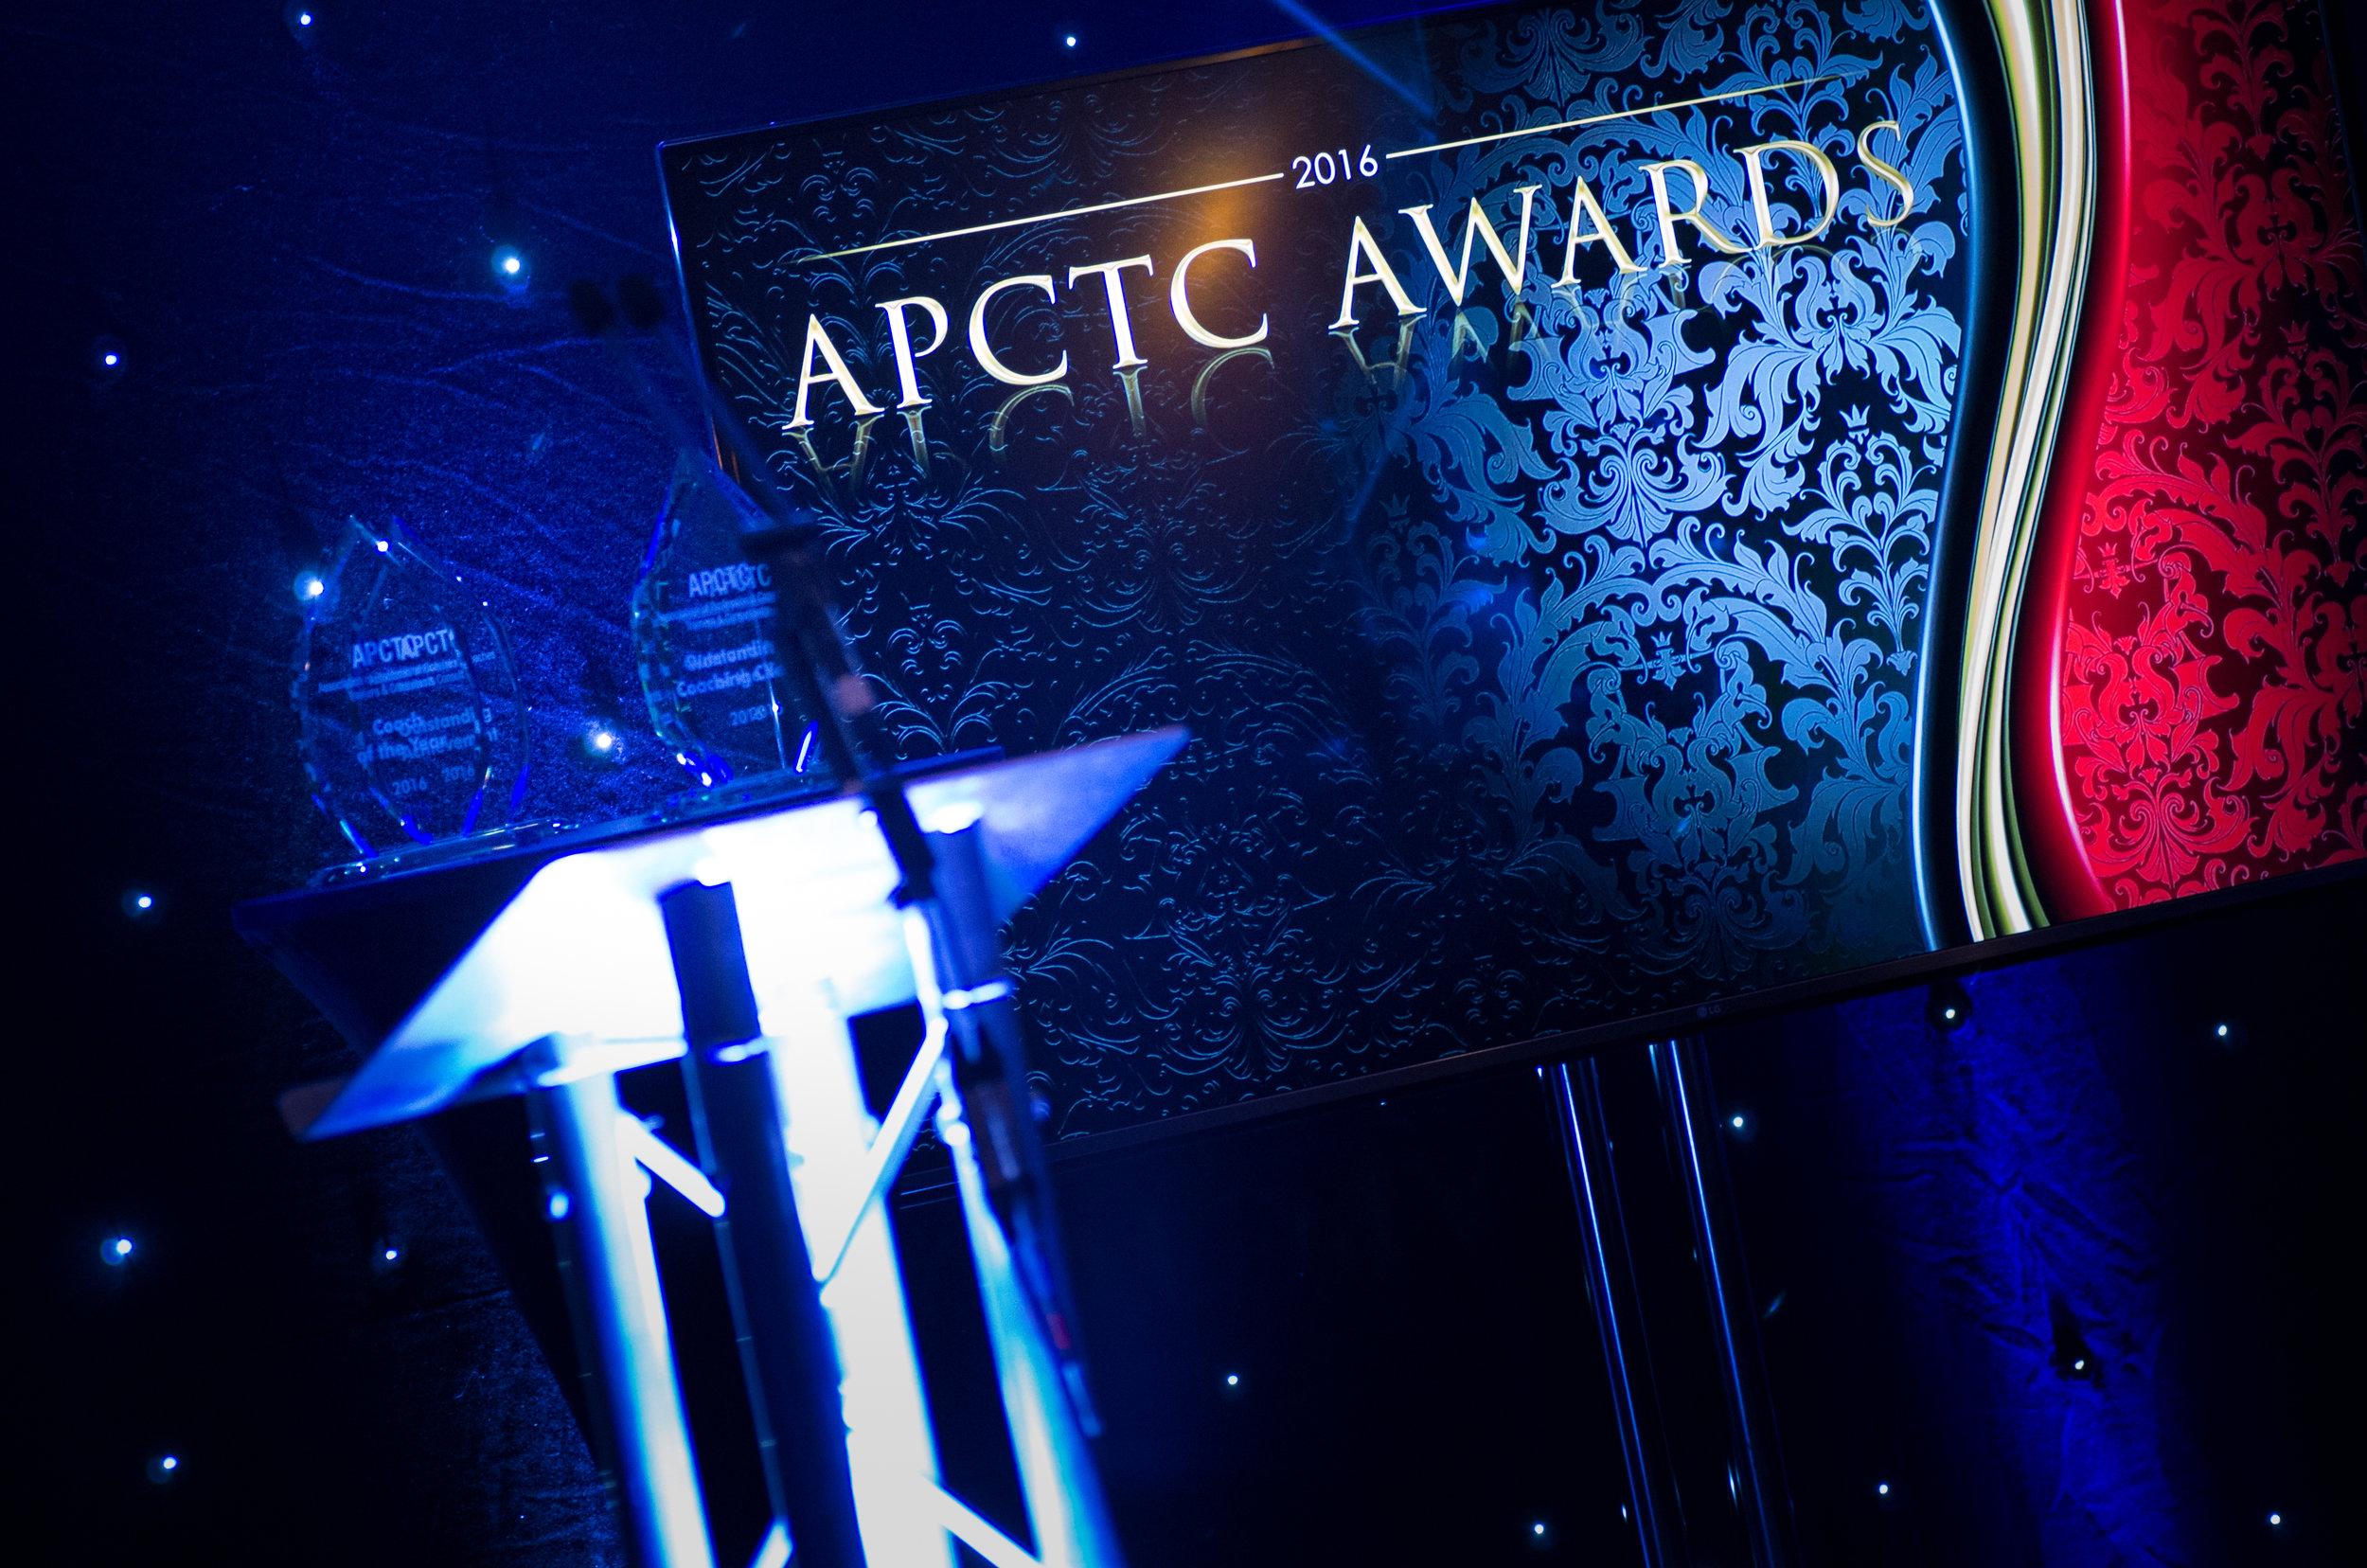 APCTC Awards 2016-7304.jpg